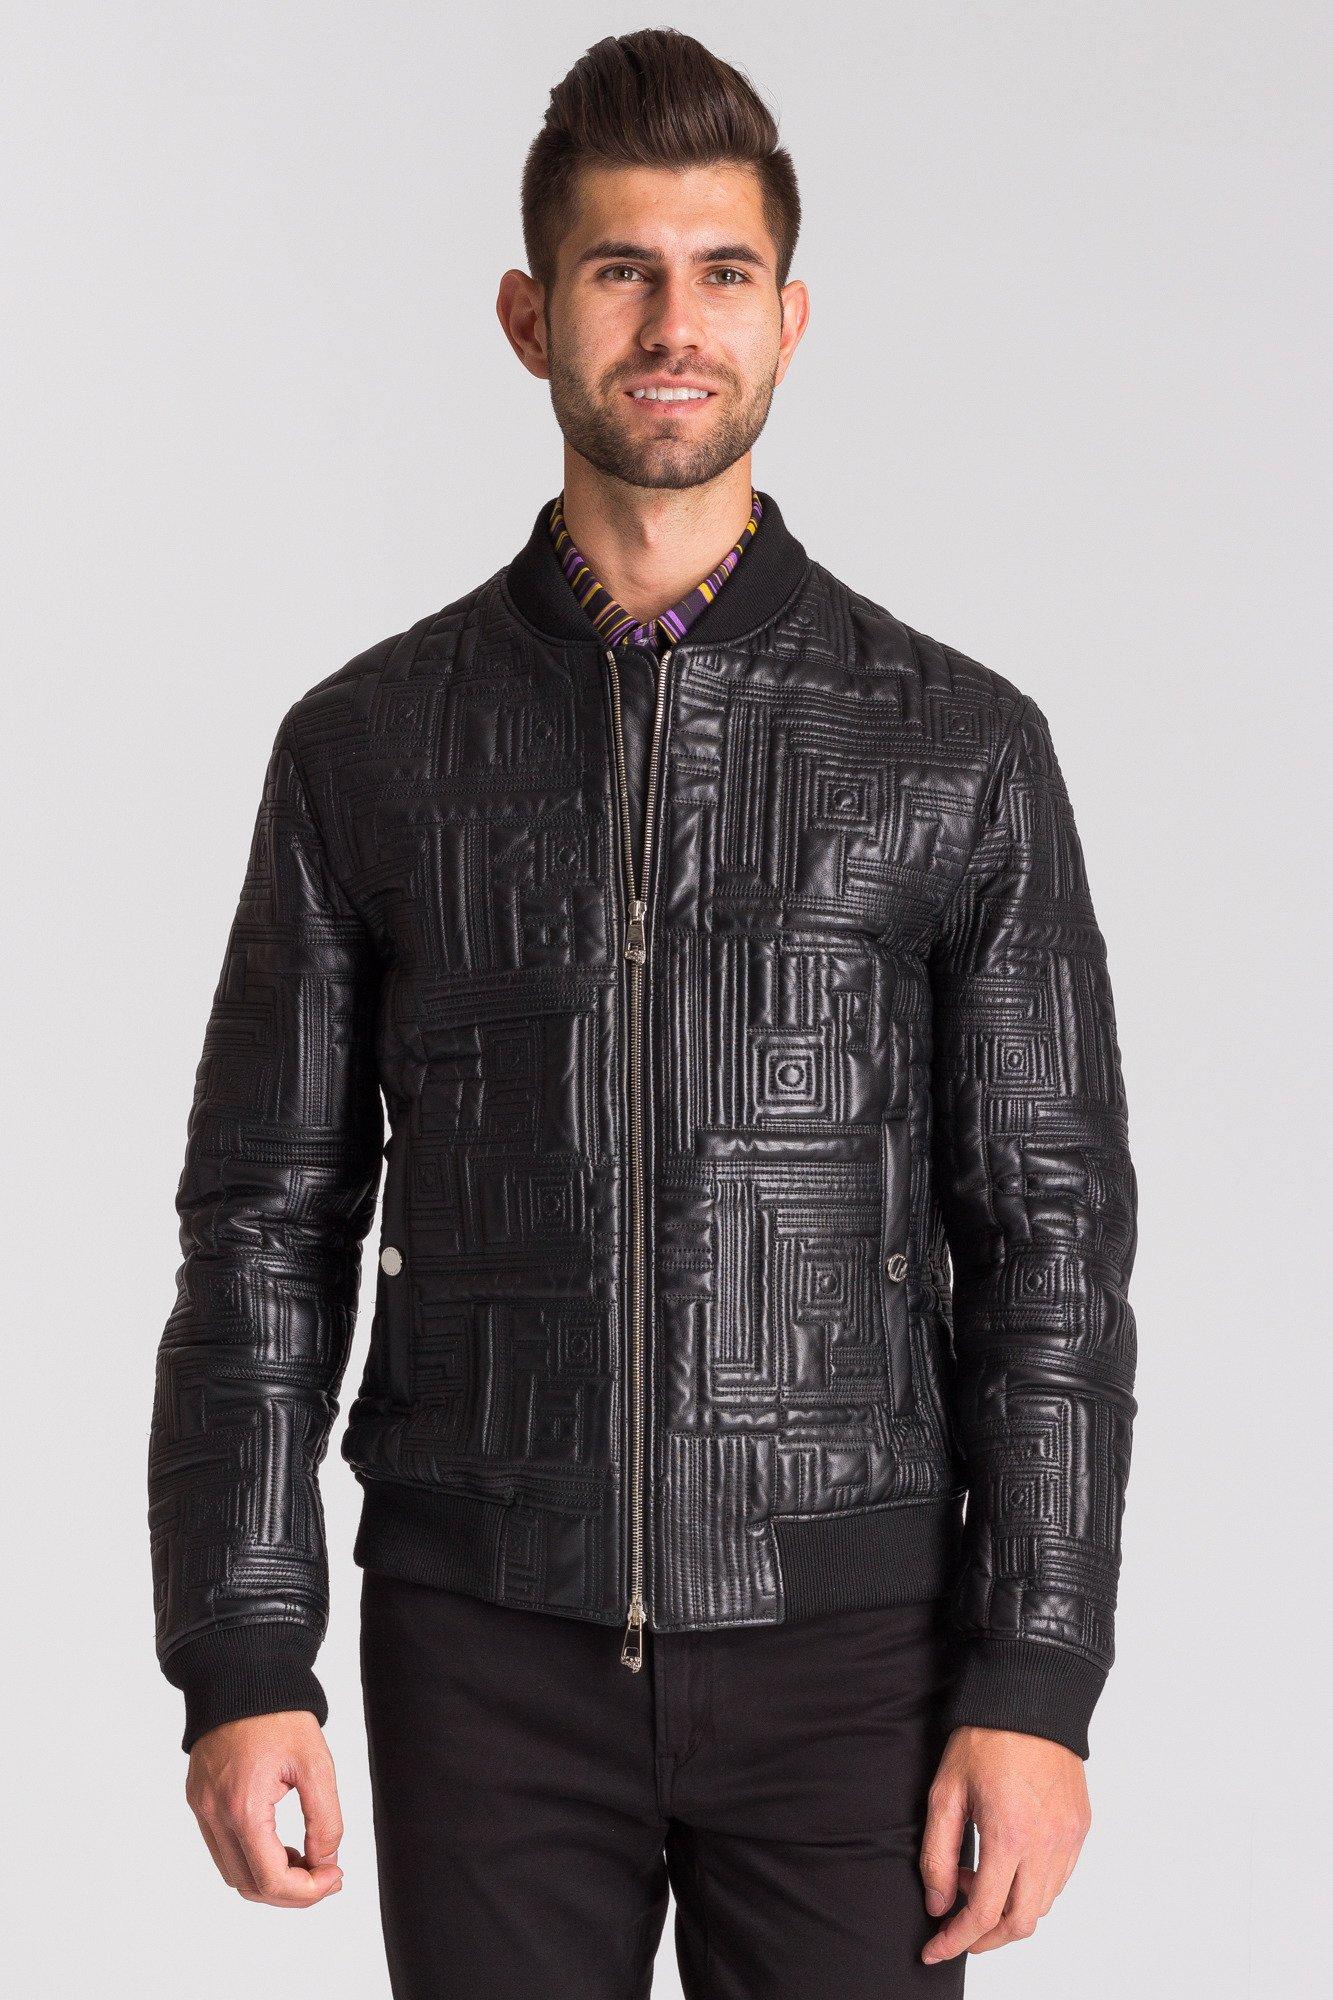 Czarna skórzana kurtka męska we wzór